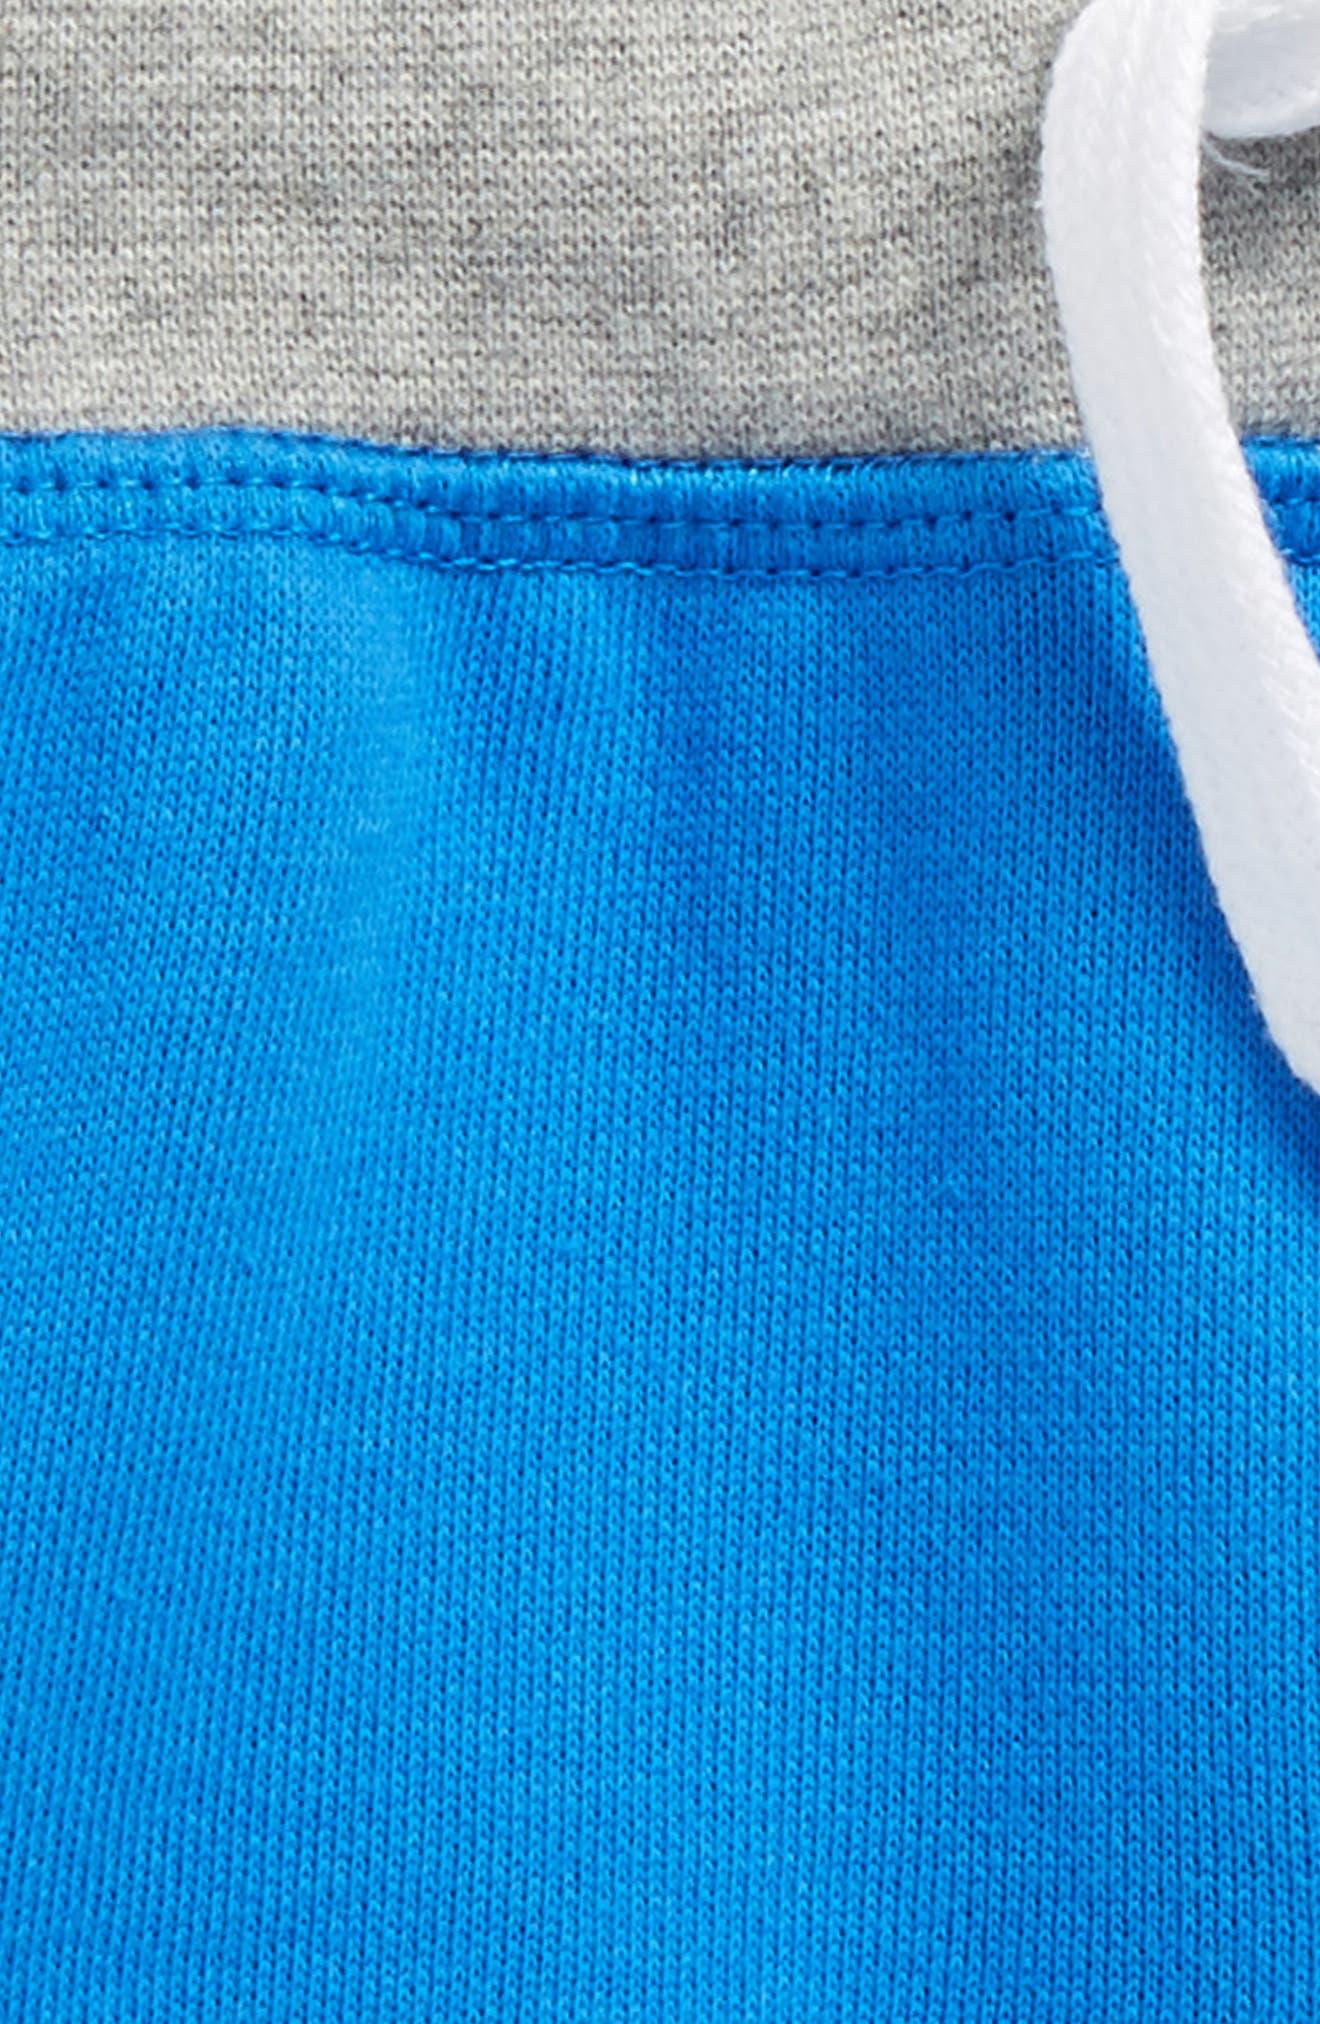 Pull On Shorts,                             Alternate thumbnail 2, color,                             400